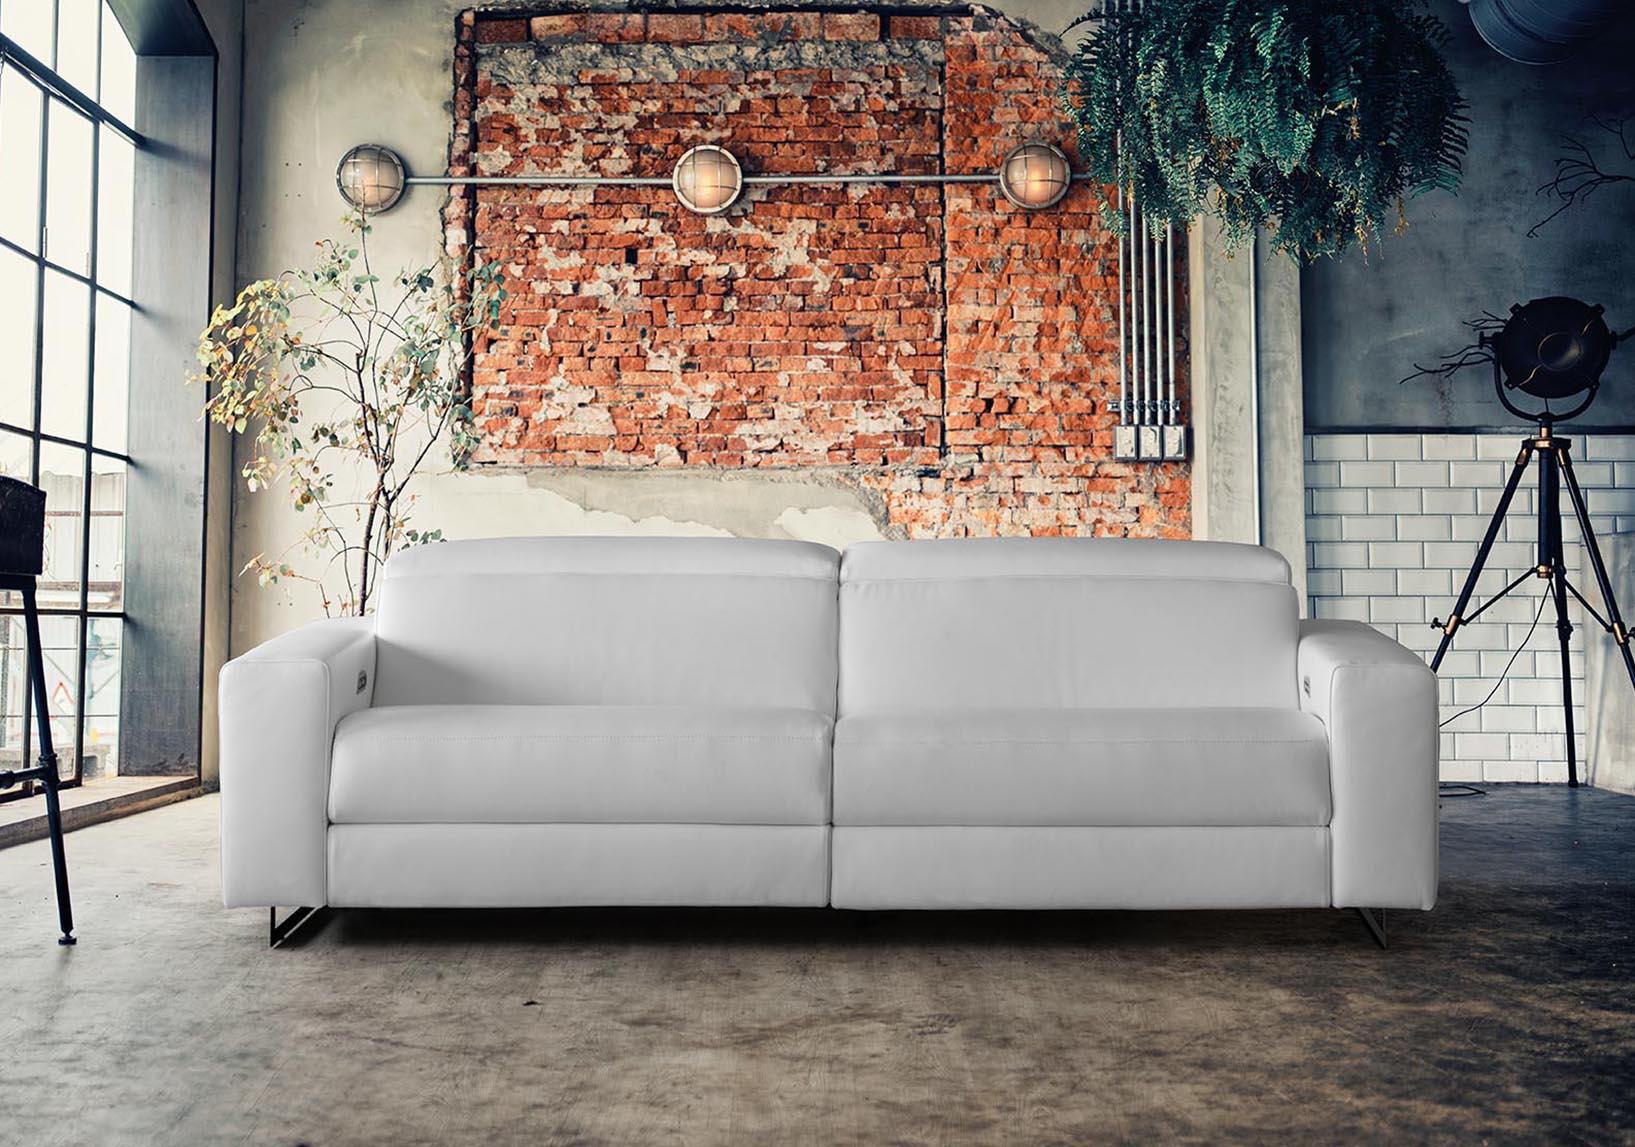 sofás cama, sofa barato, sofas de cuero, sofas de piel